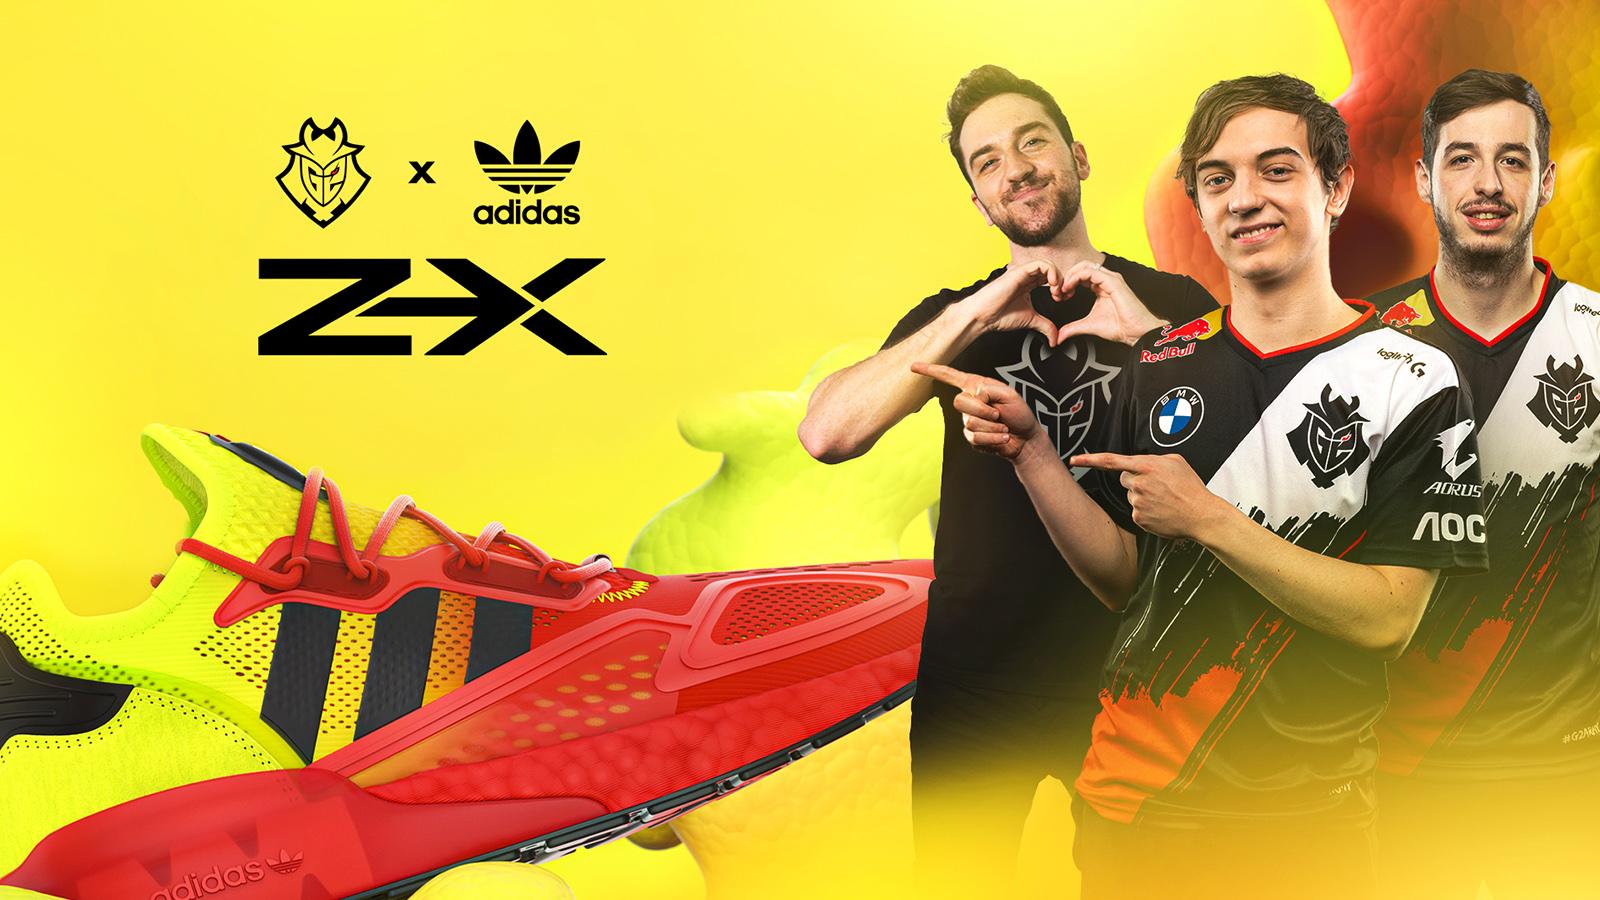 G2 Esports adidas Partnership